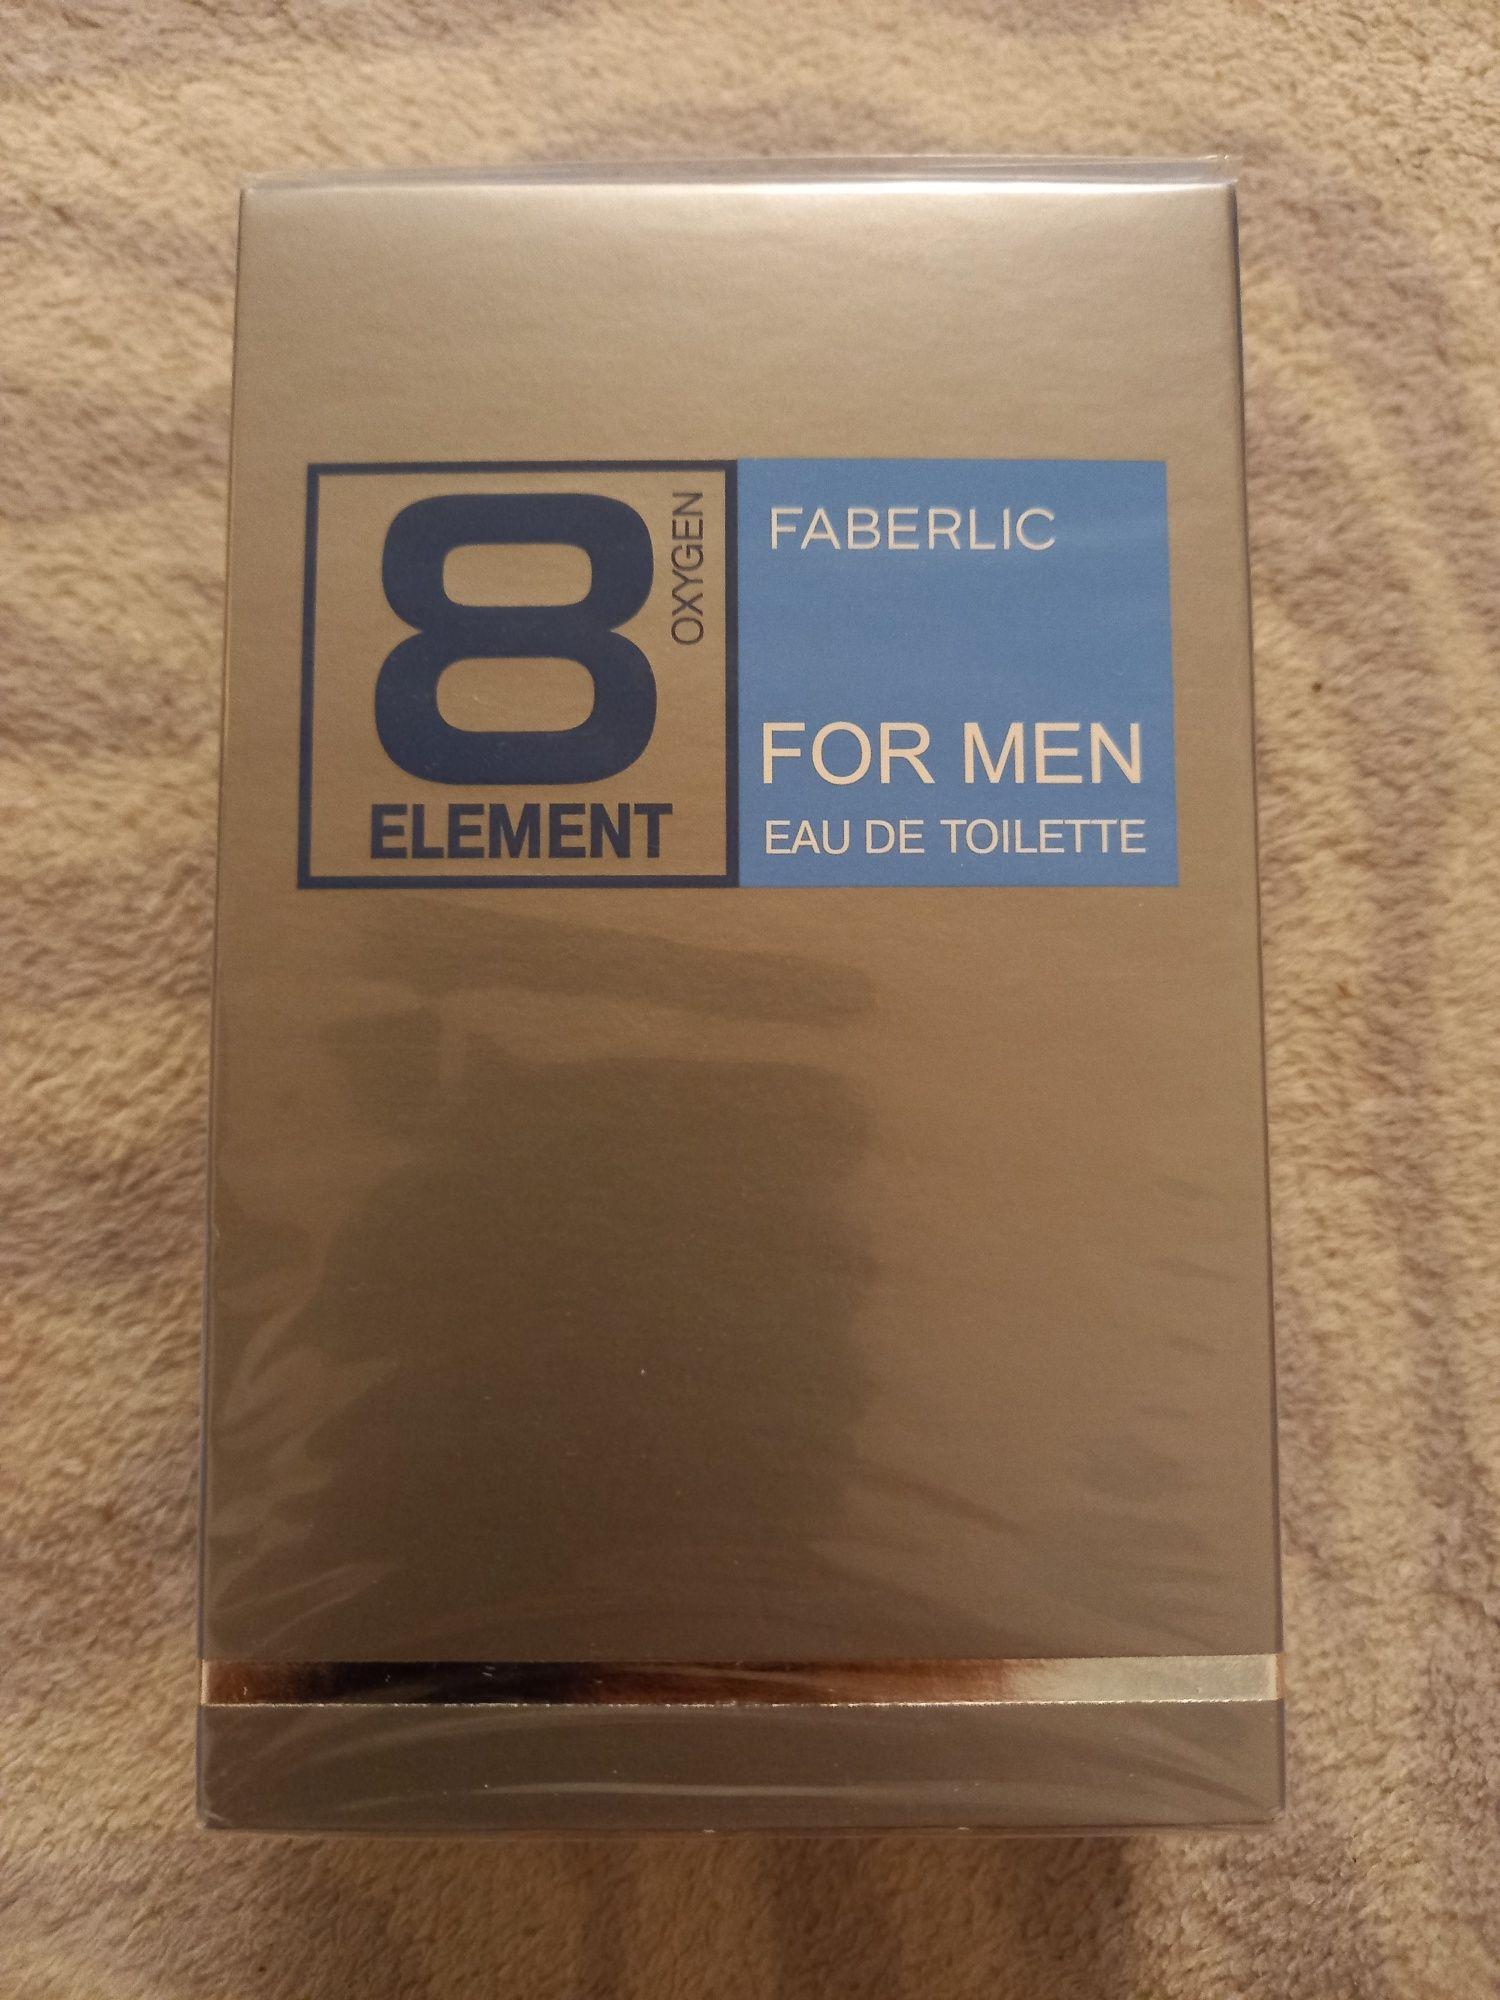 8 элемент от Фаберлик 100 мл.